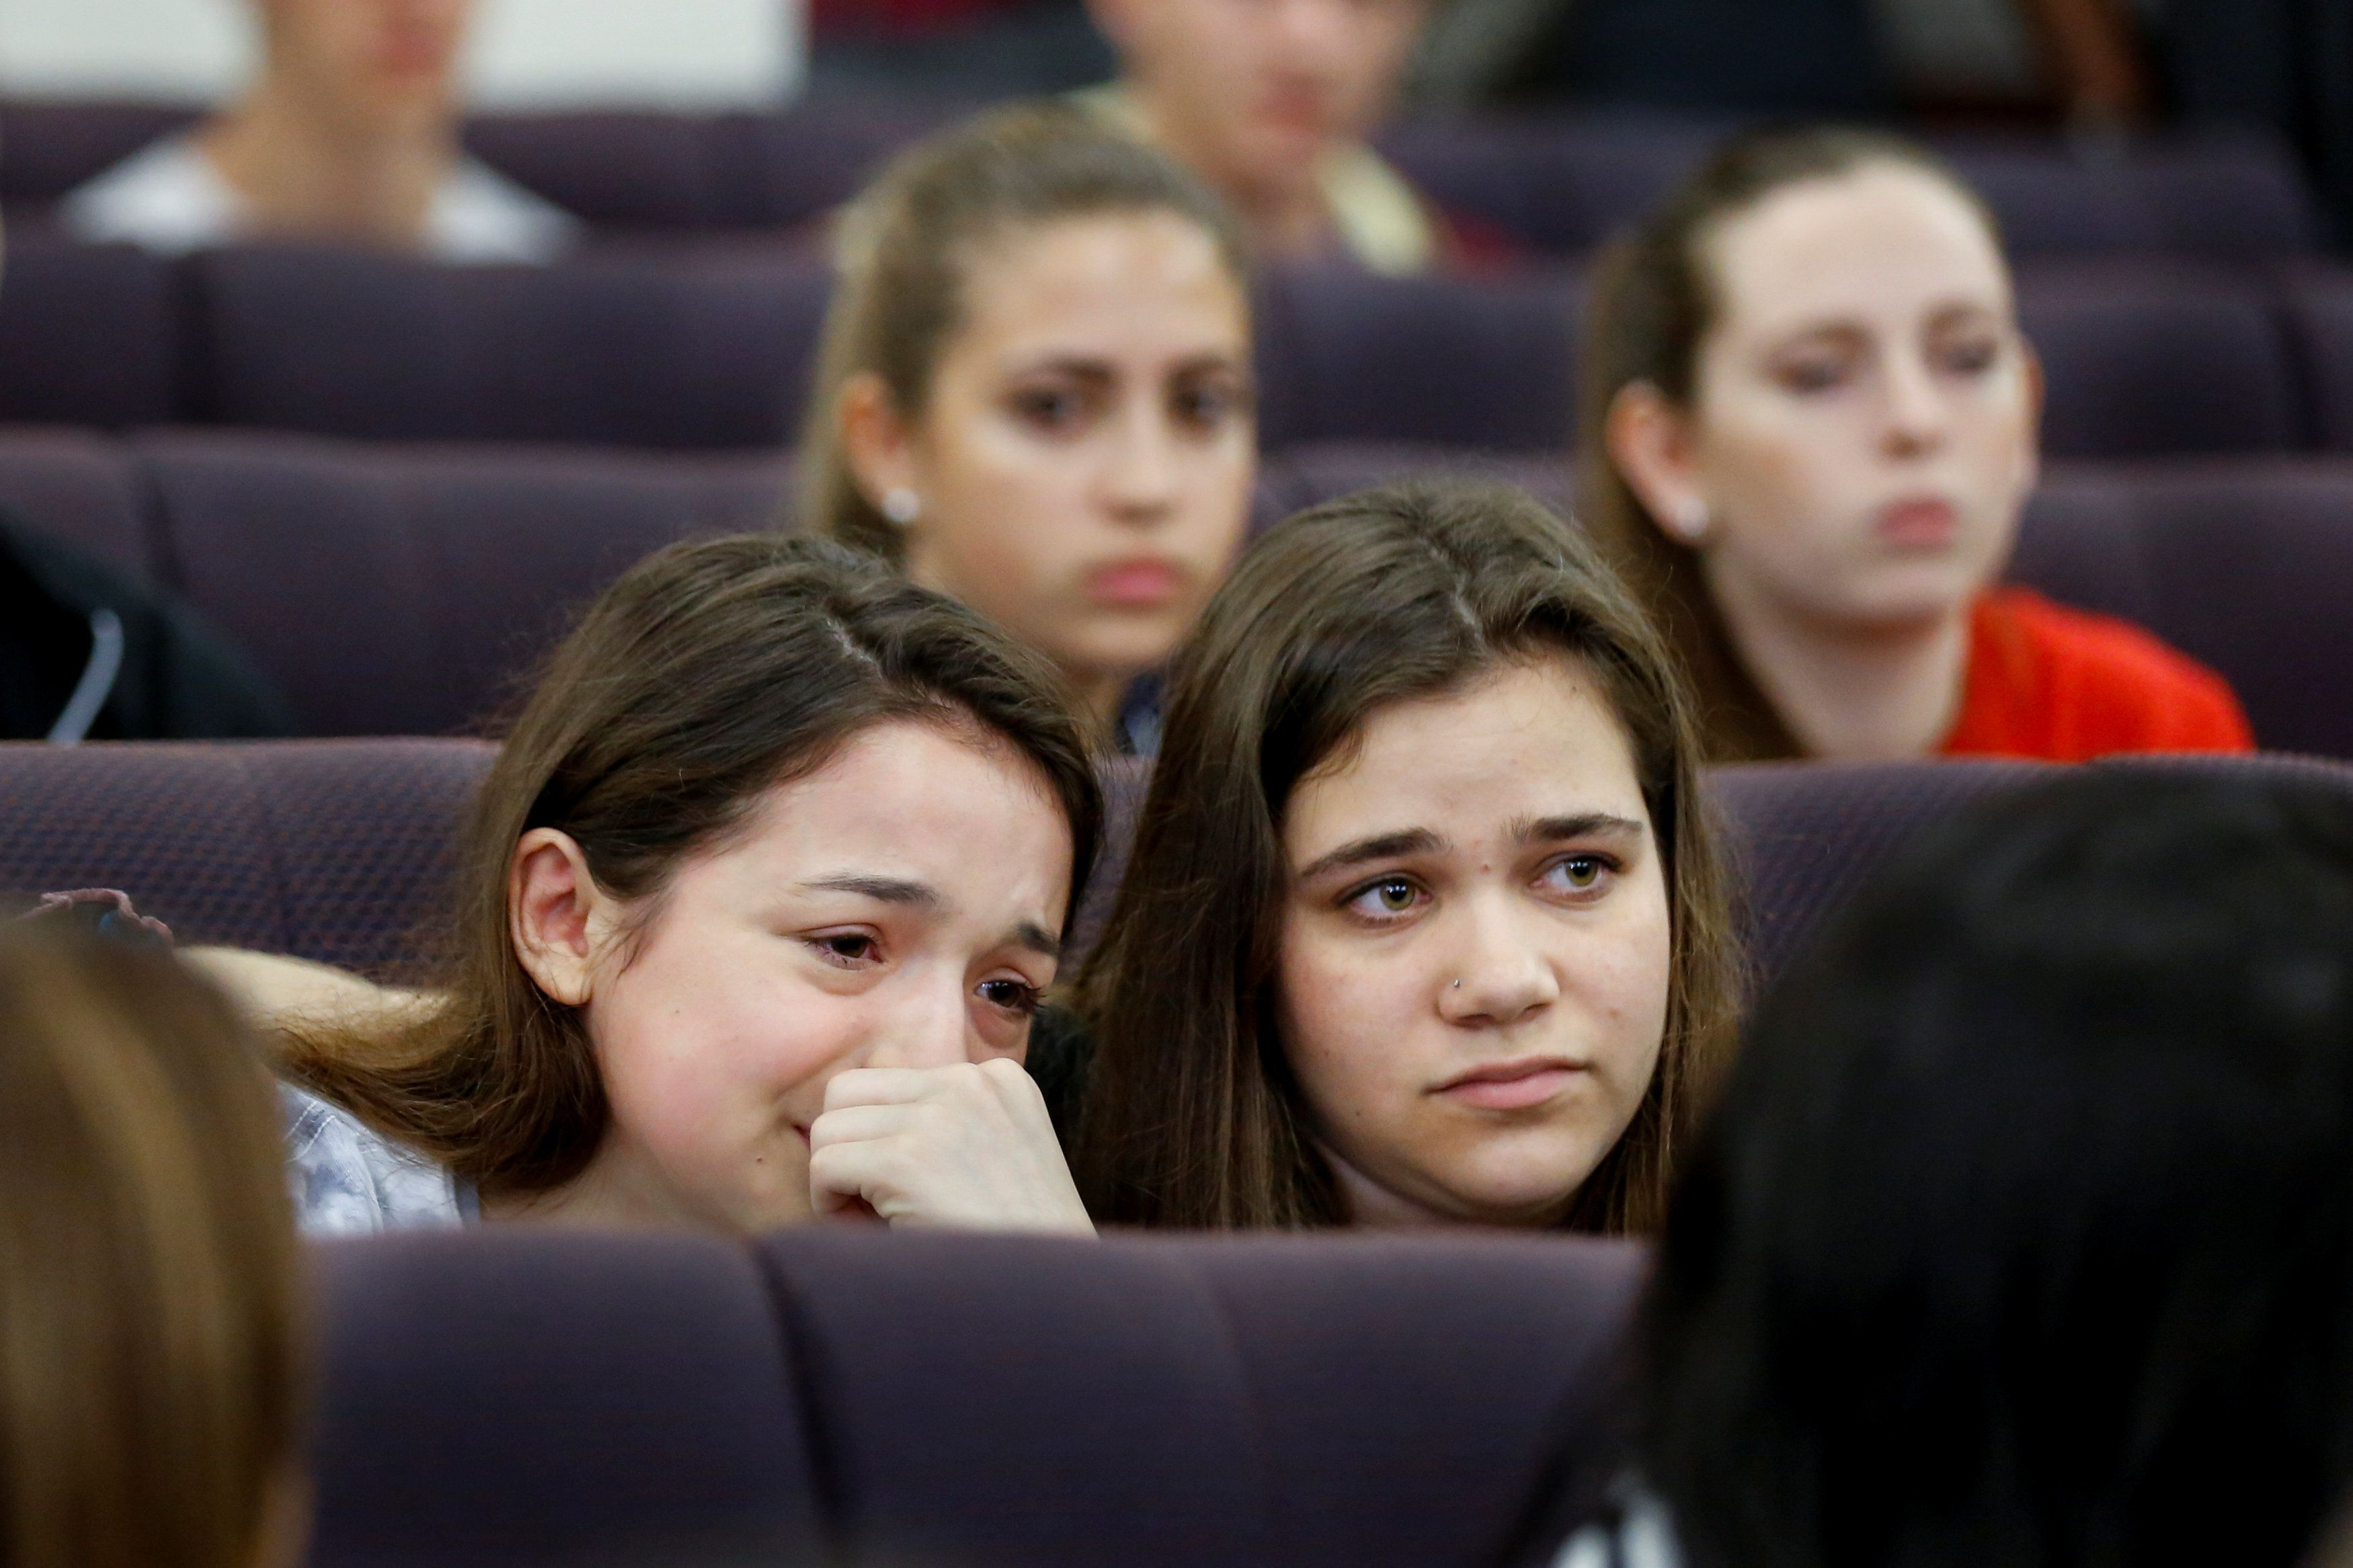 Marjory Stoneman Douglas High School student Alondra Gittelson (left) is comforted by schoolmate Bailey Feuerman after Gittle